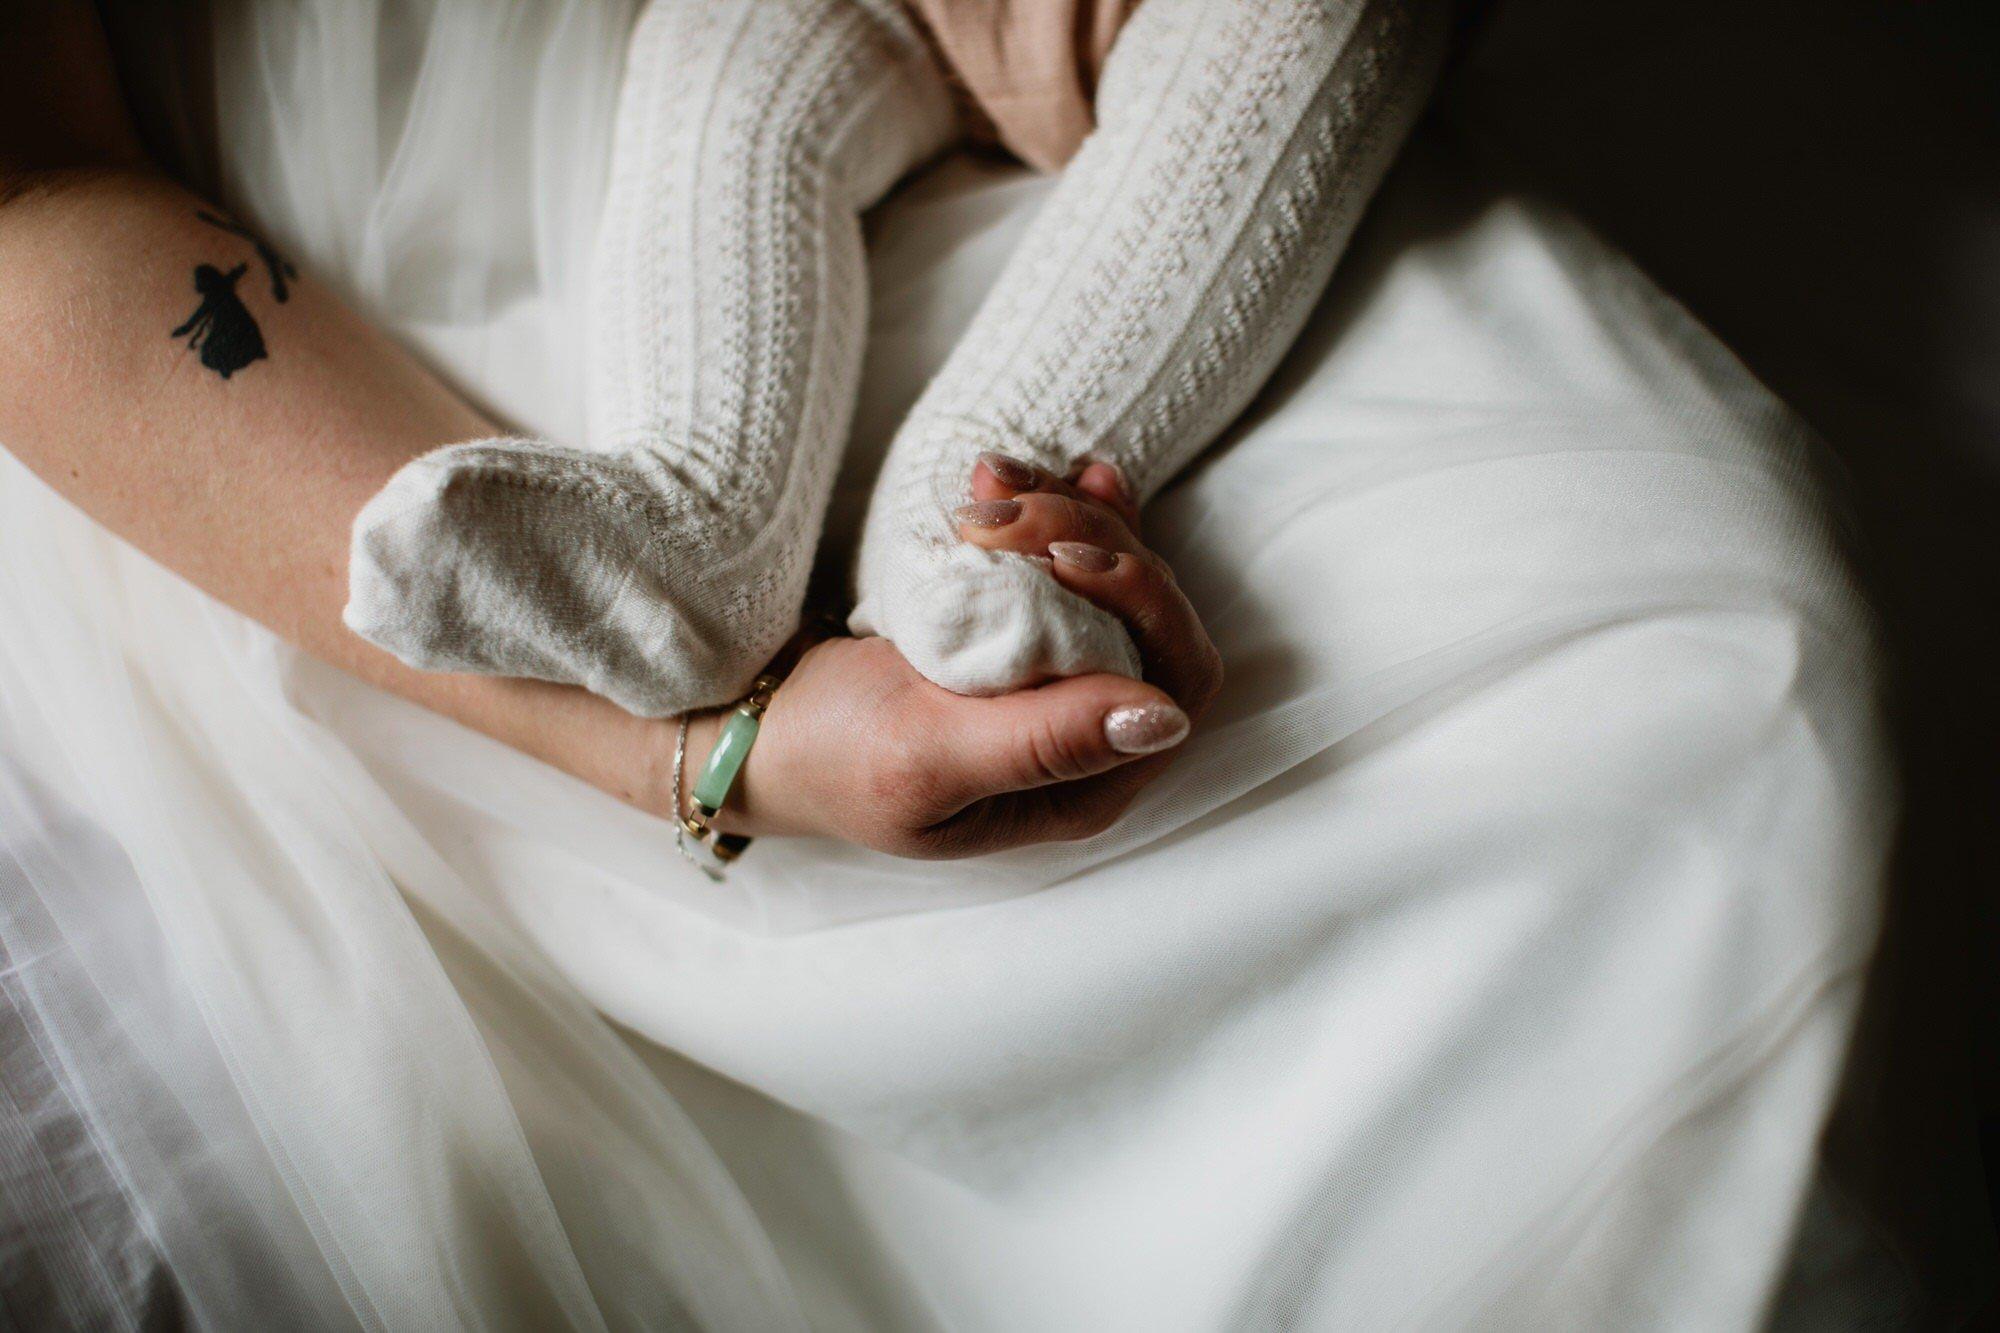 011 TIN SHED KNOCKRAICH WEDDING AUSTRIAN SCOTTISH ZOE ALEXANDRA PHOTOGRAPHY